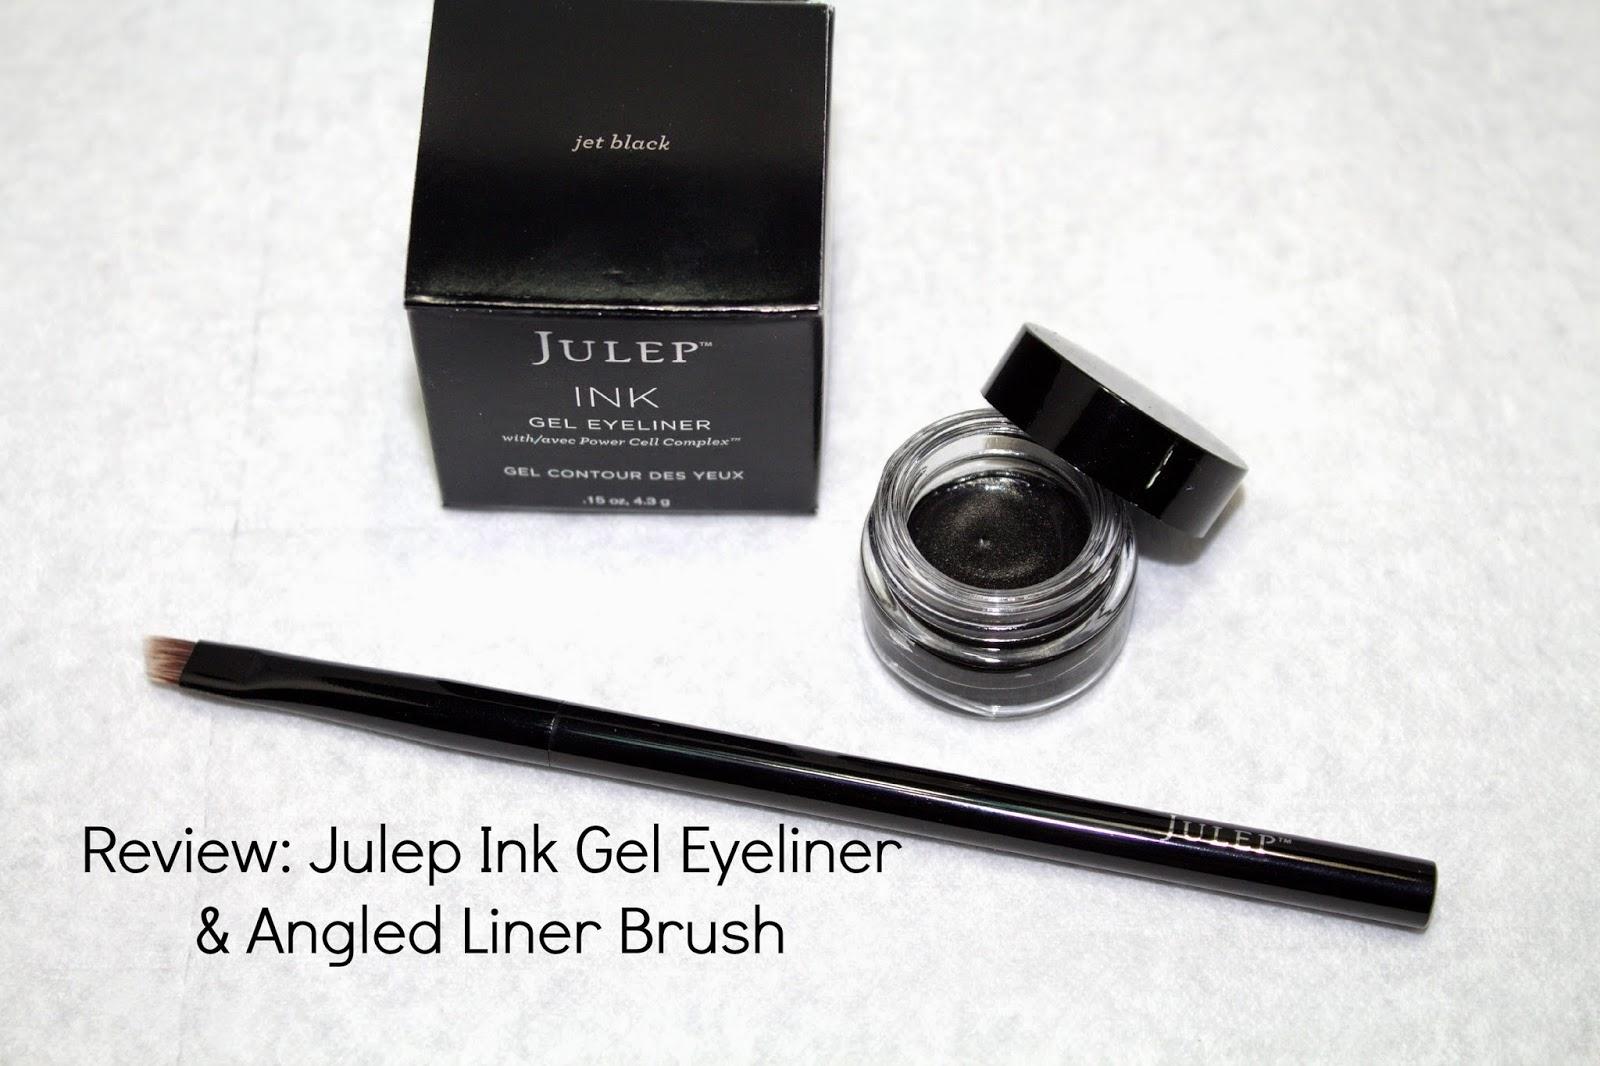 Julep Ink gel eyeliner, Julep angled liner brush, review, @girlythingsby_e